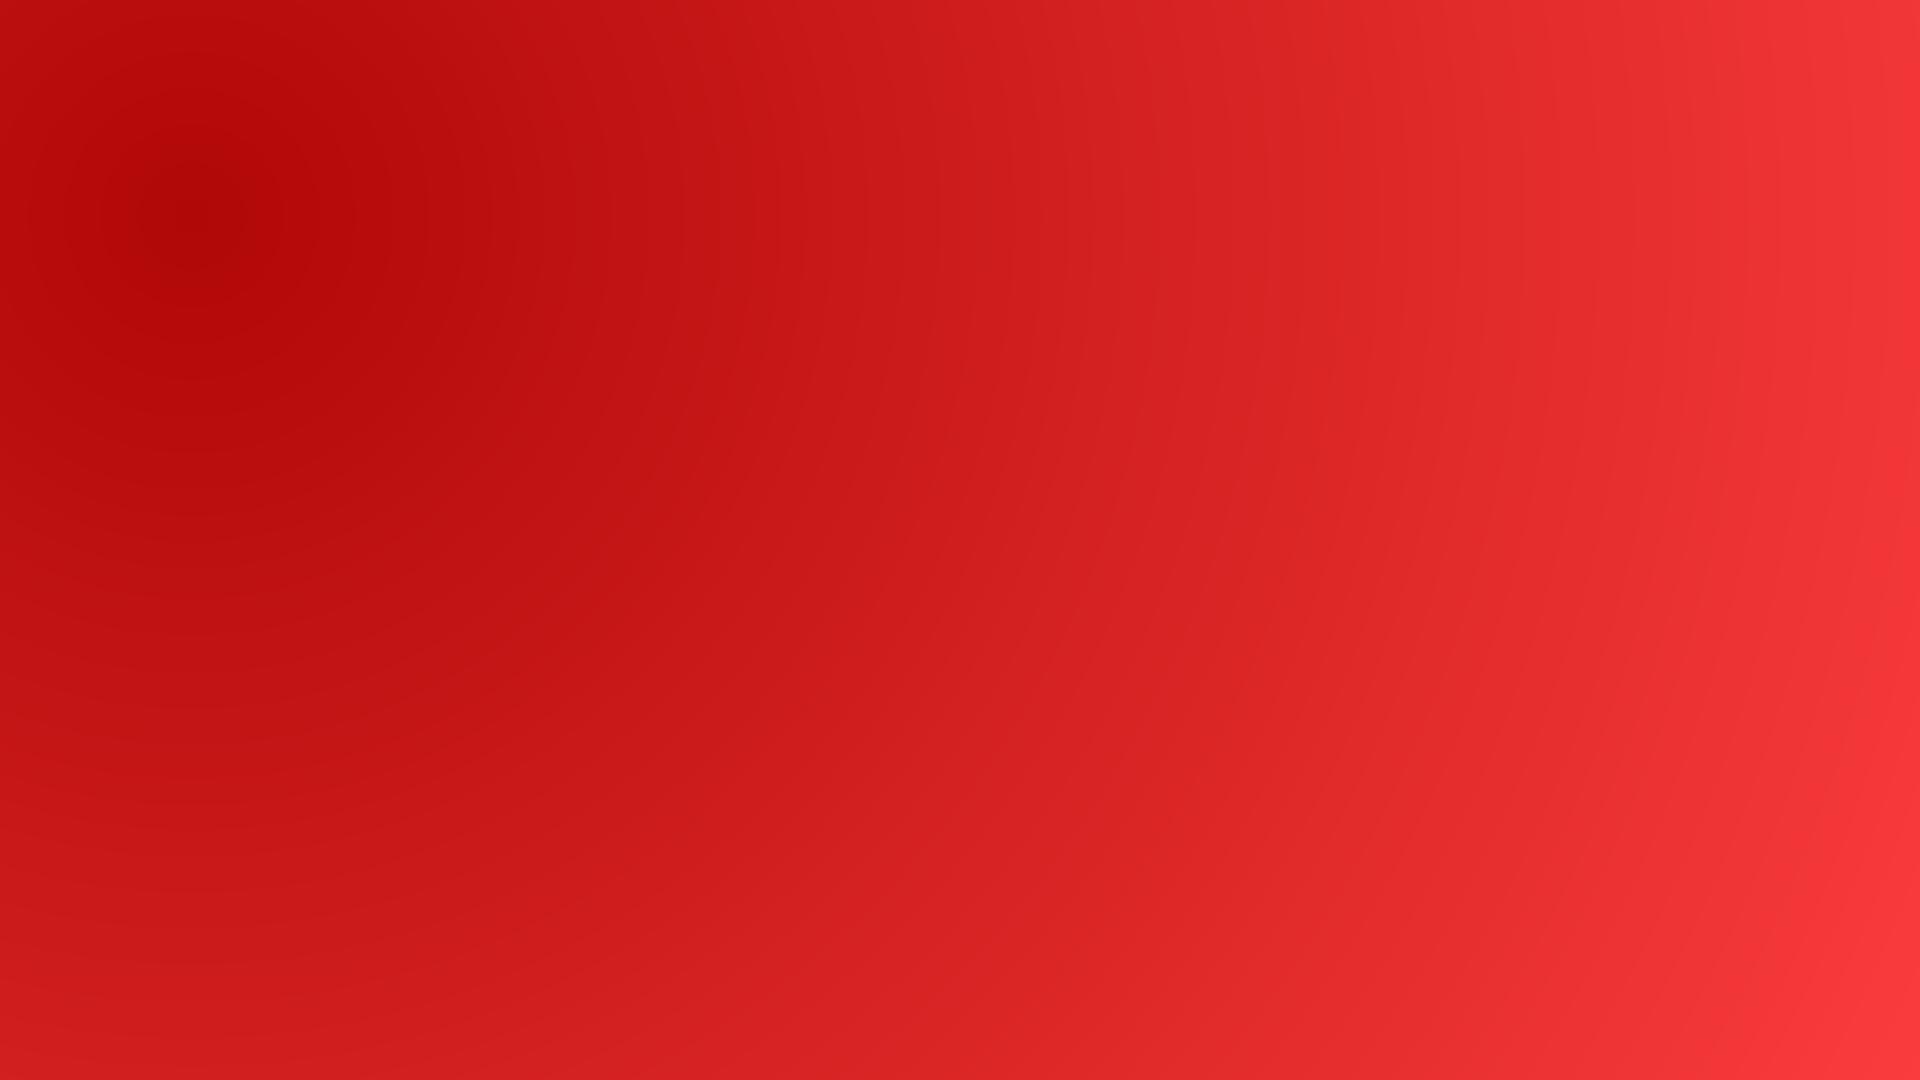 Red Gradient